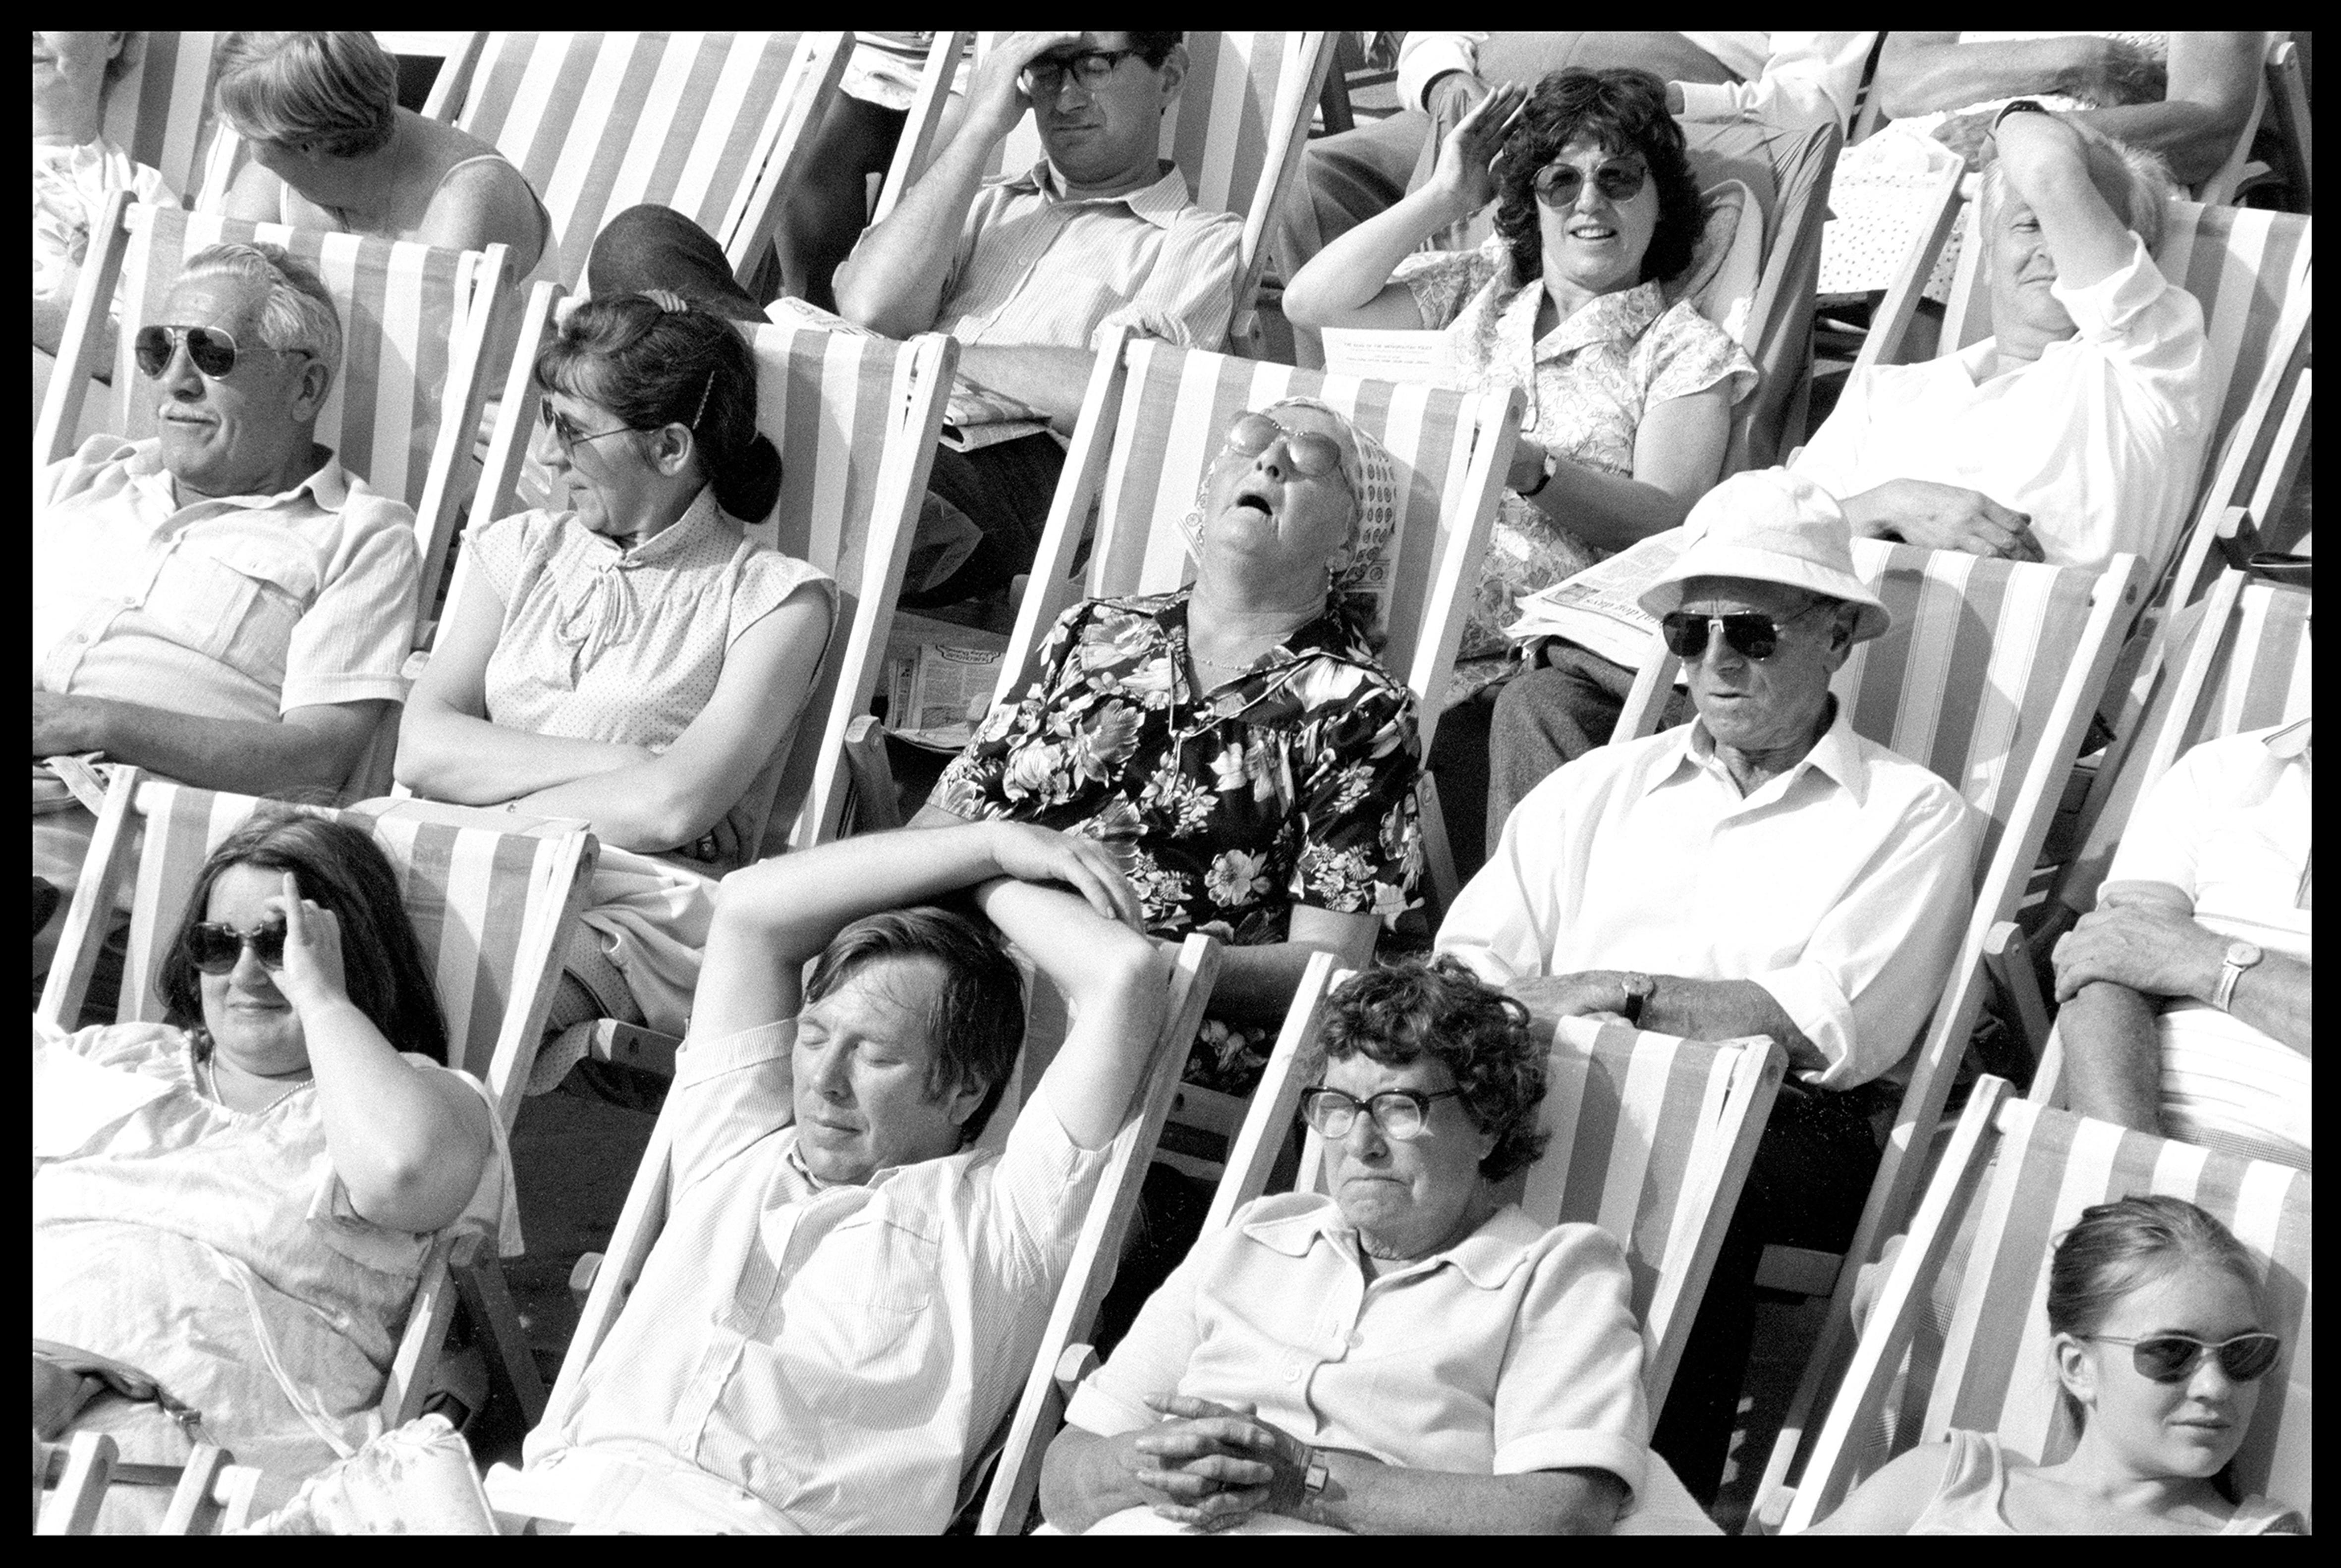 Bandstand I, Eastbourne - Black and White Vintage Portrait Photography